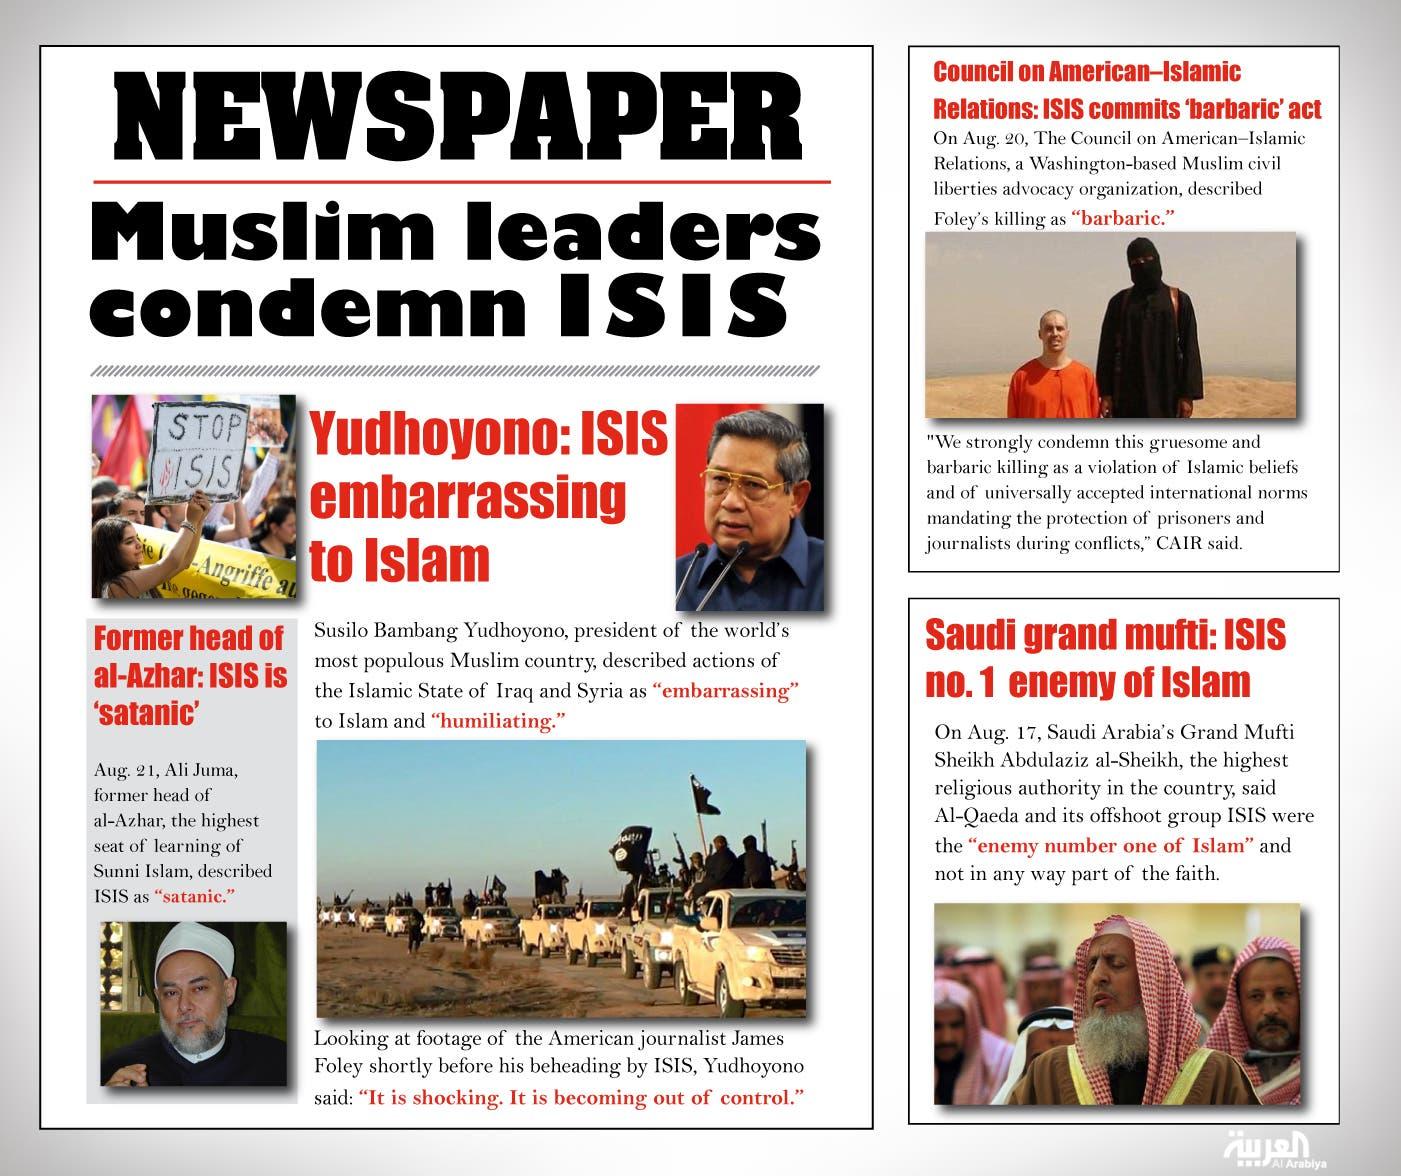 Infographic: Muslim leaders condemn ISIS